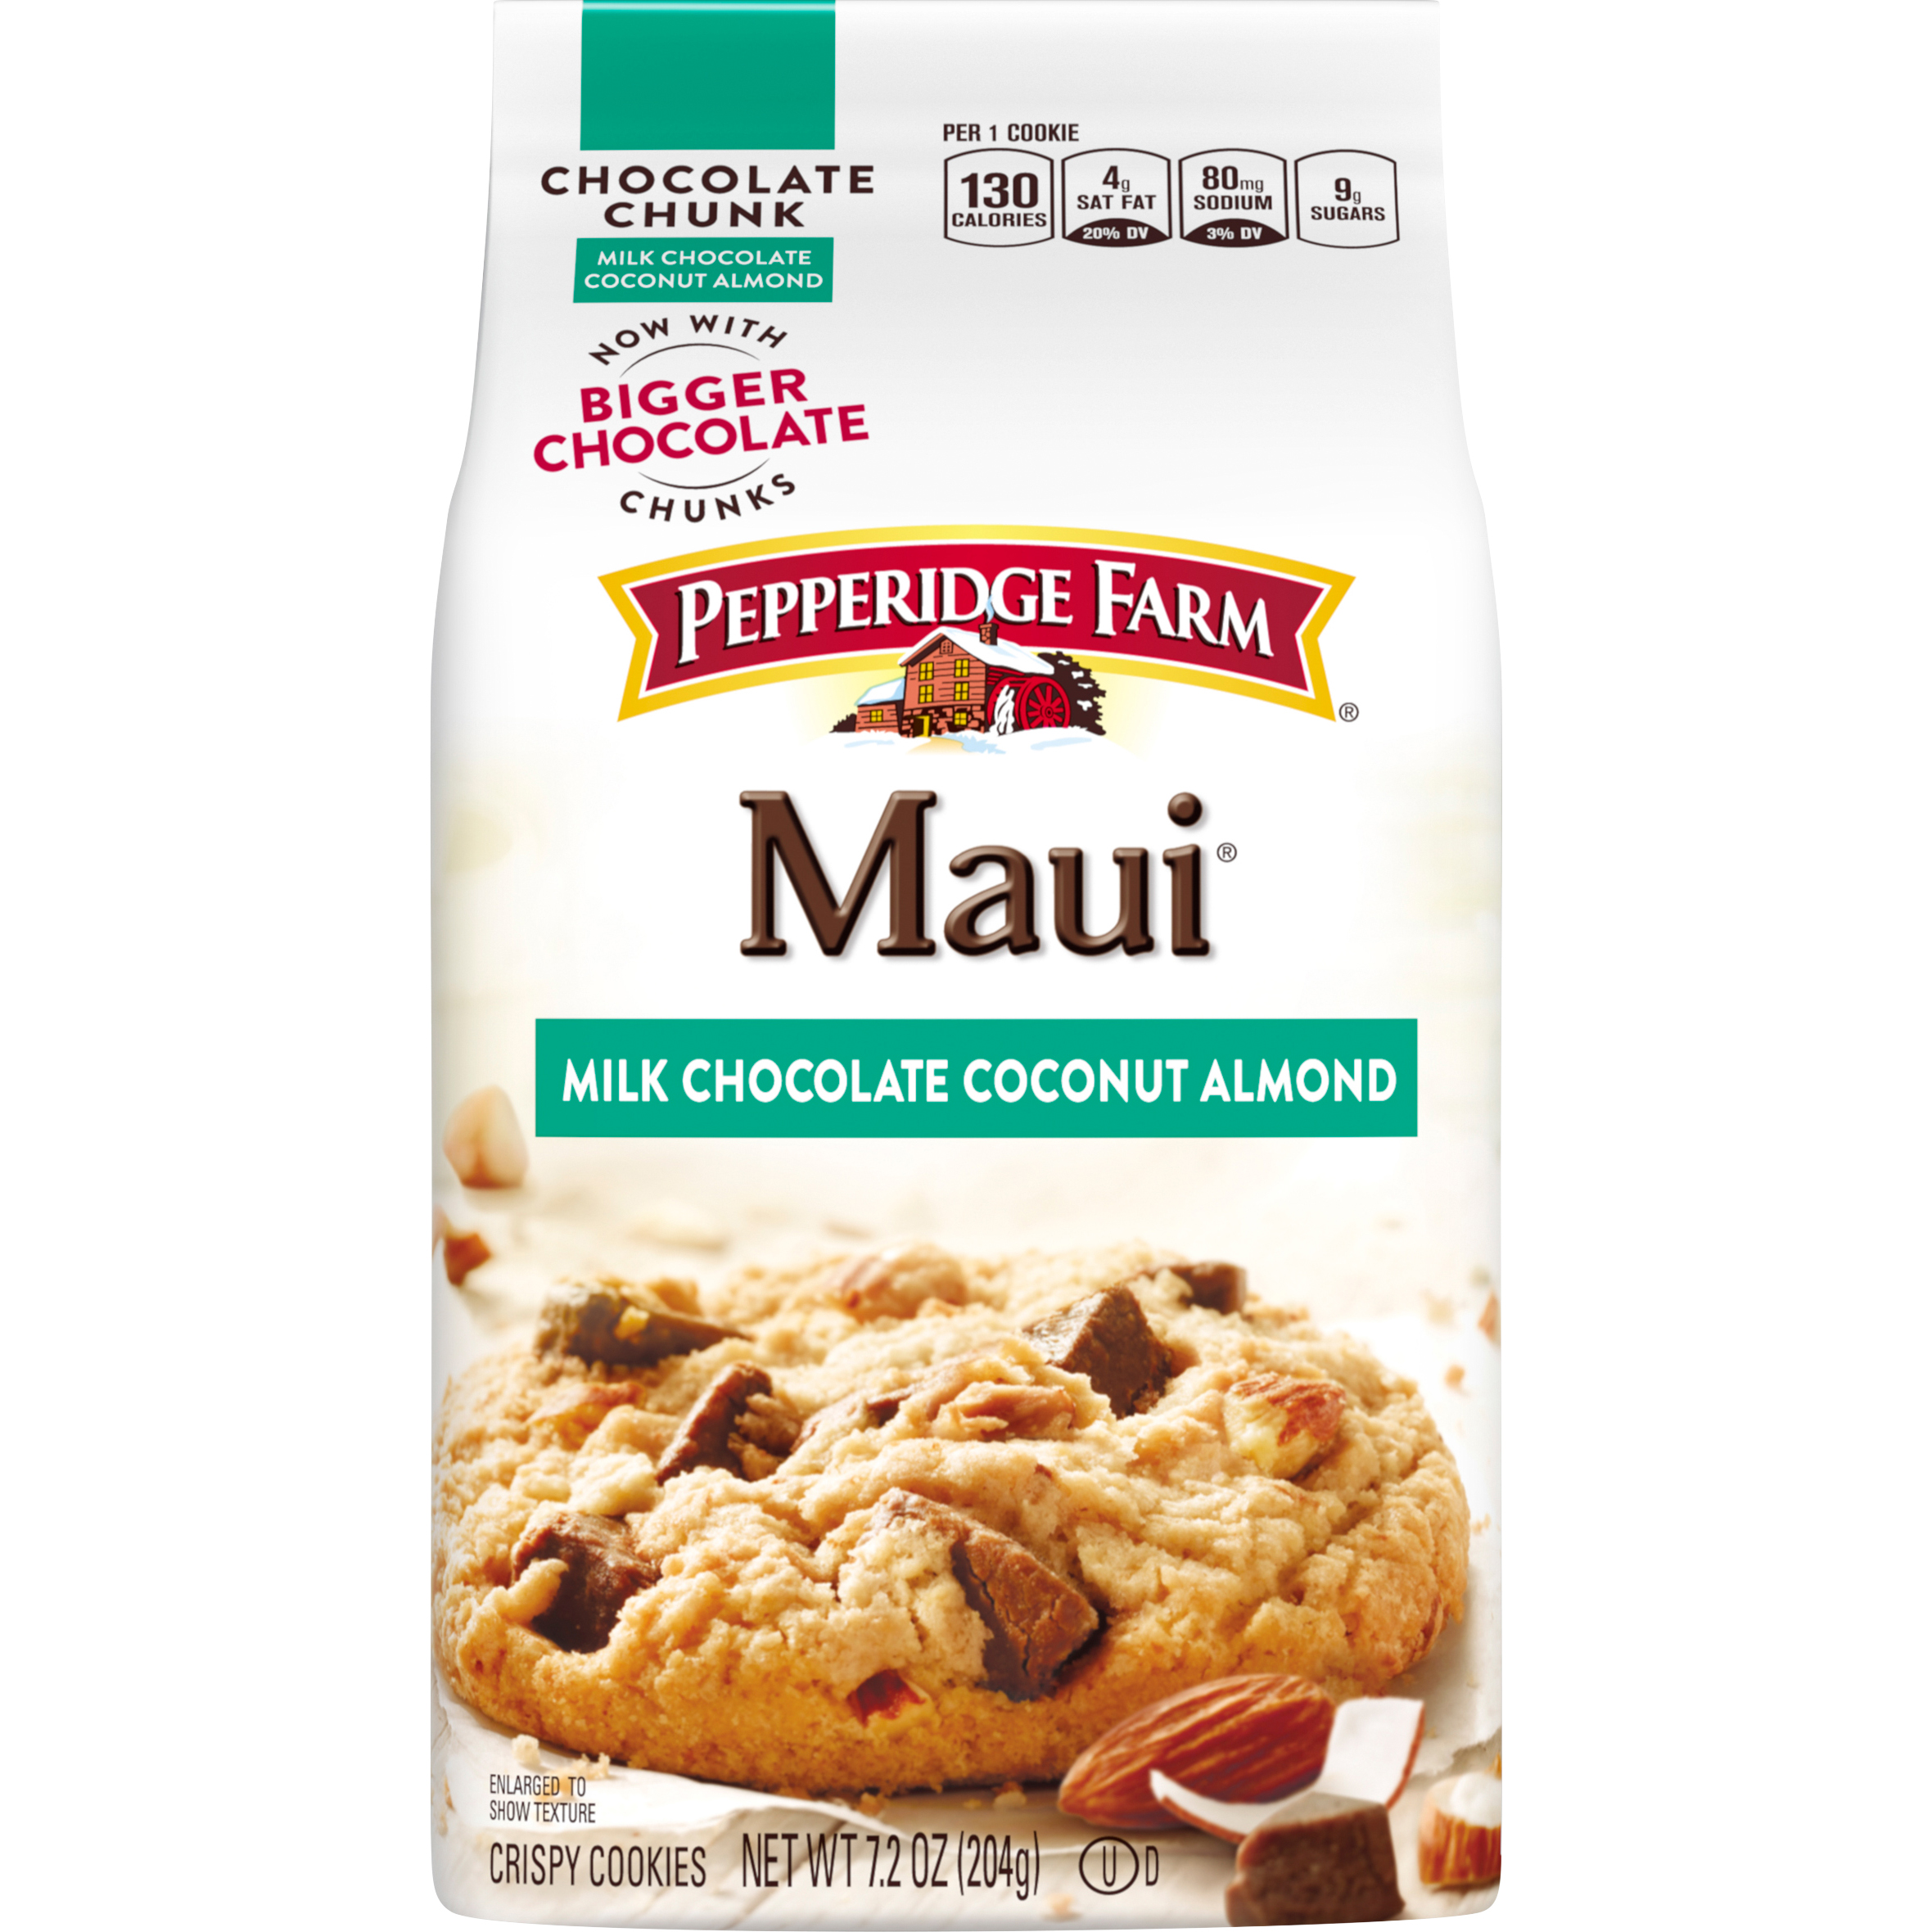 Pepperidge Farm Maui Crispy Milk Chocolate Coconut Almond Cookies ...